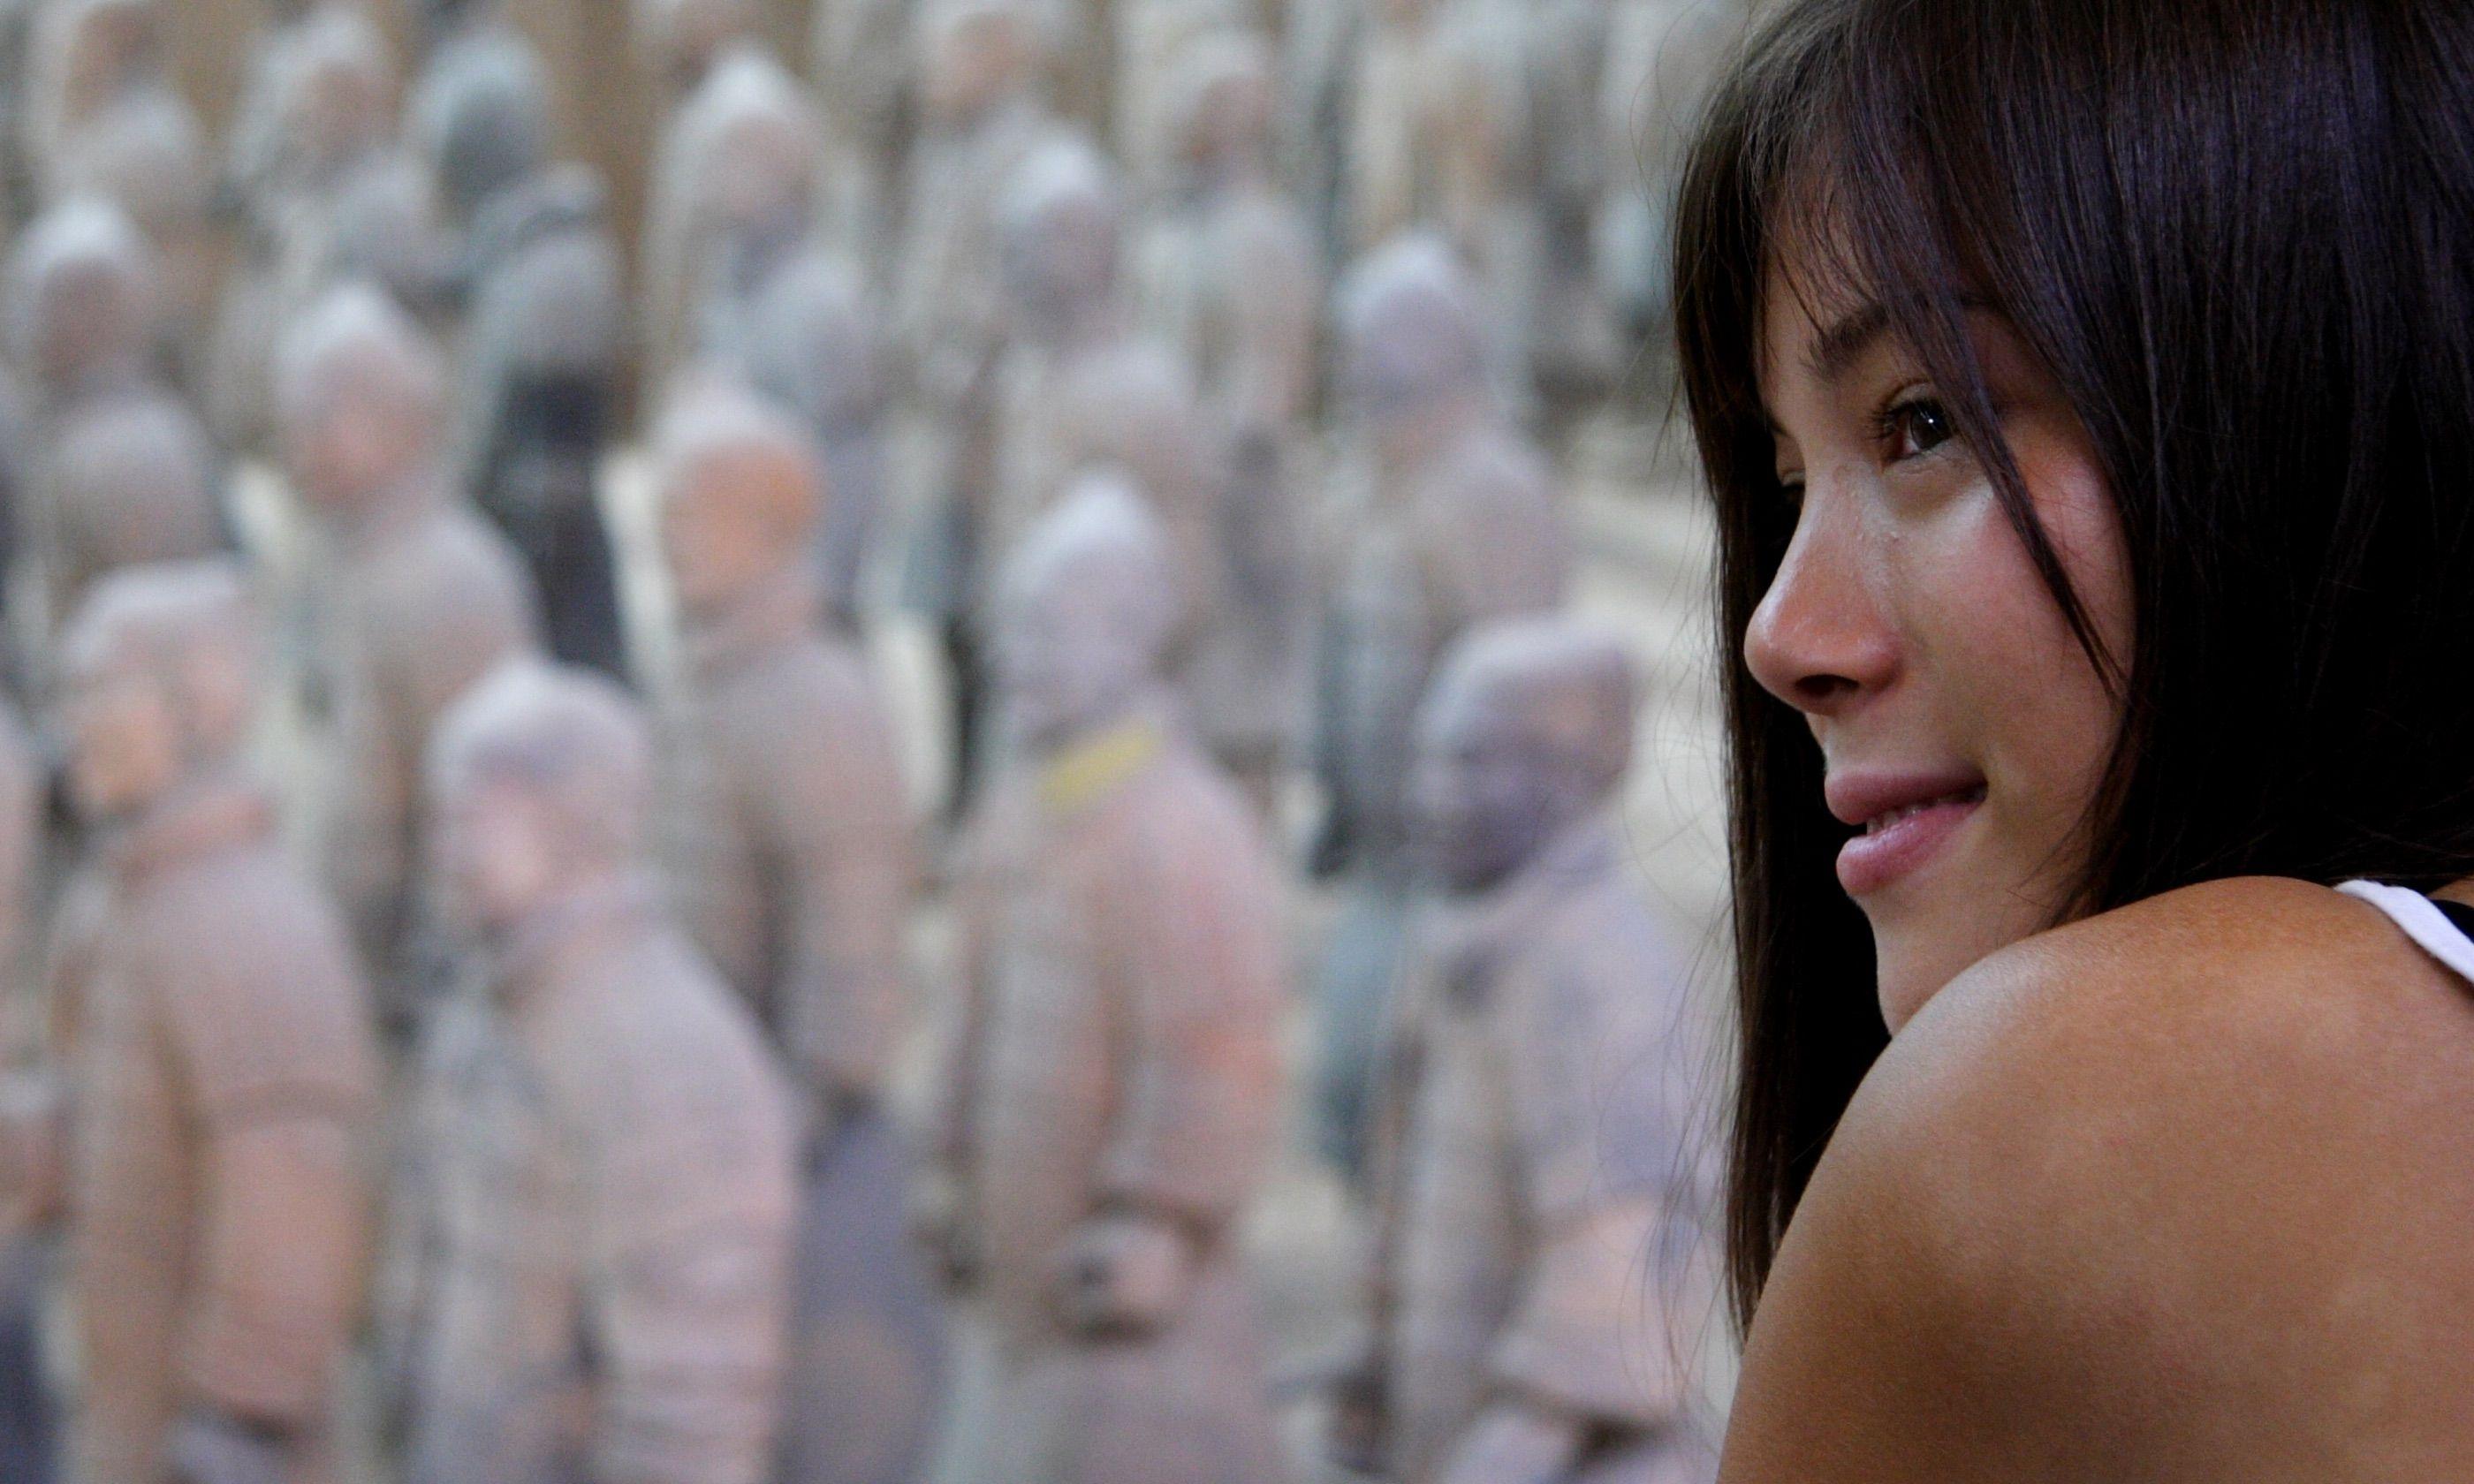 Tourist admiring the Terracotta Warriors (Dreamstime)